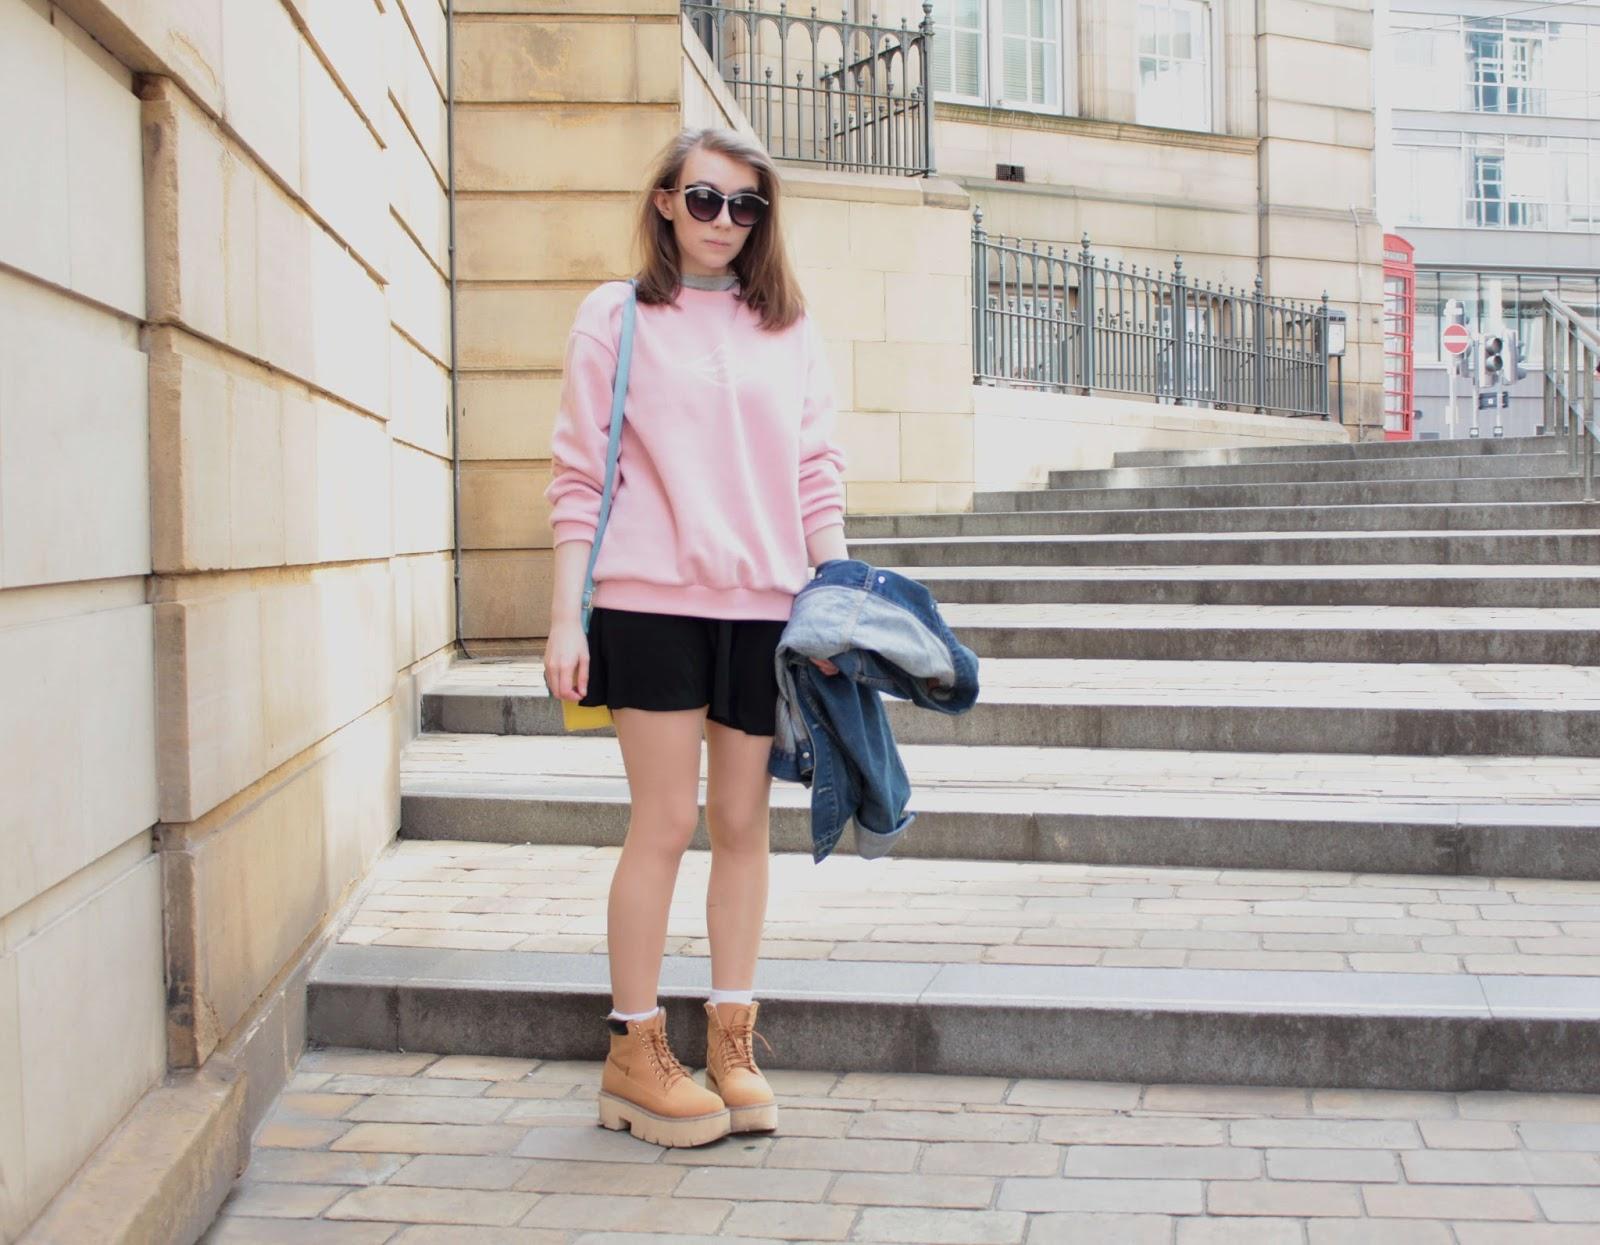 mixxmix seoul outfit of the day inspiration uk fashion blogger